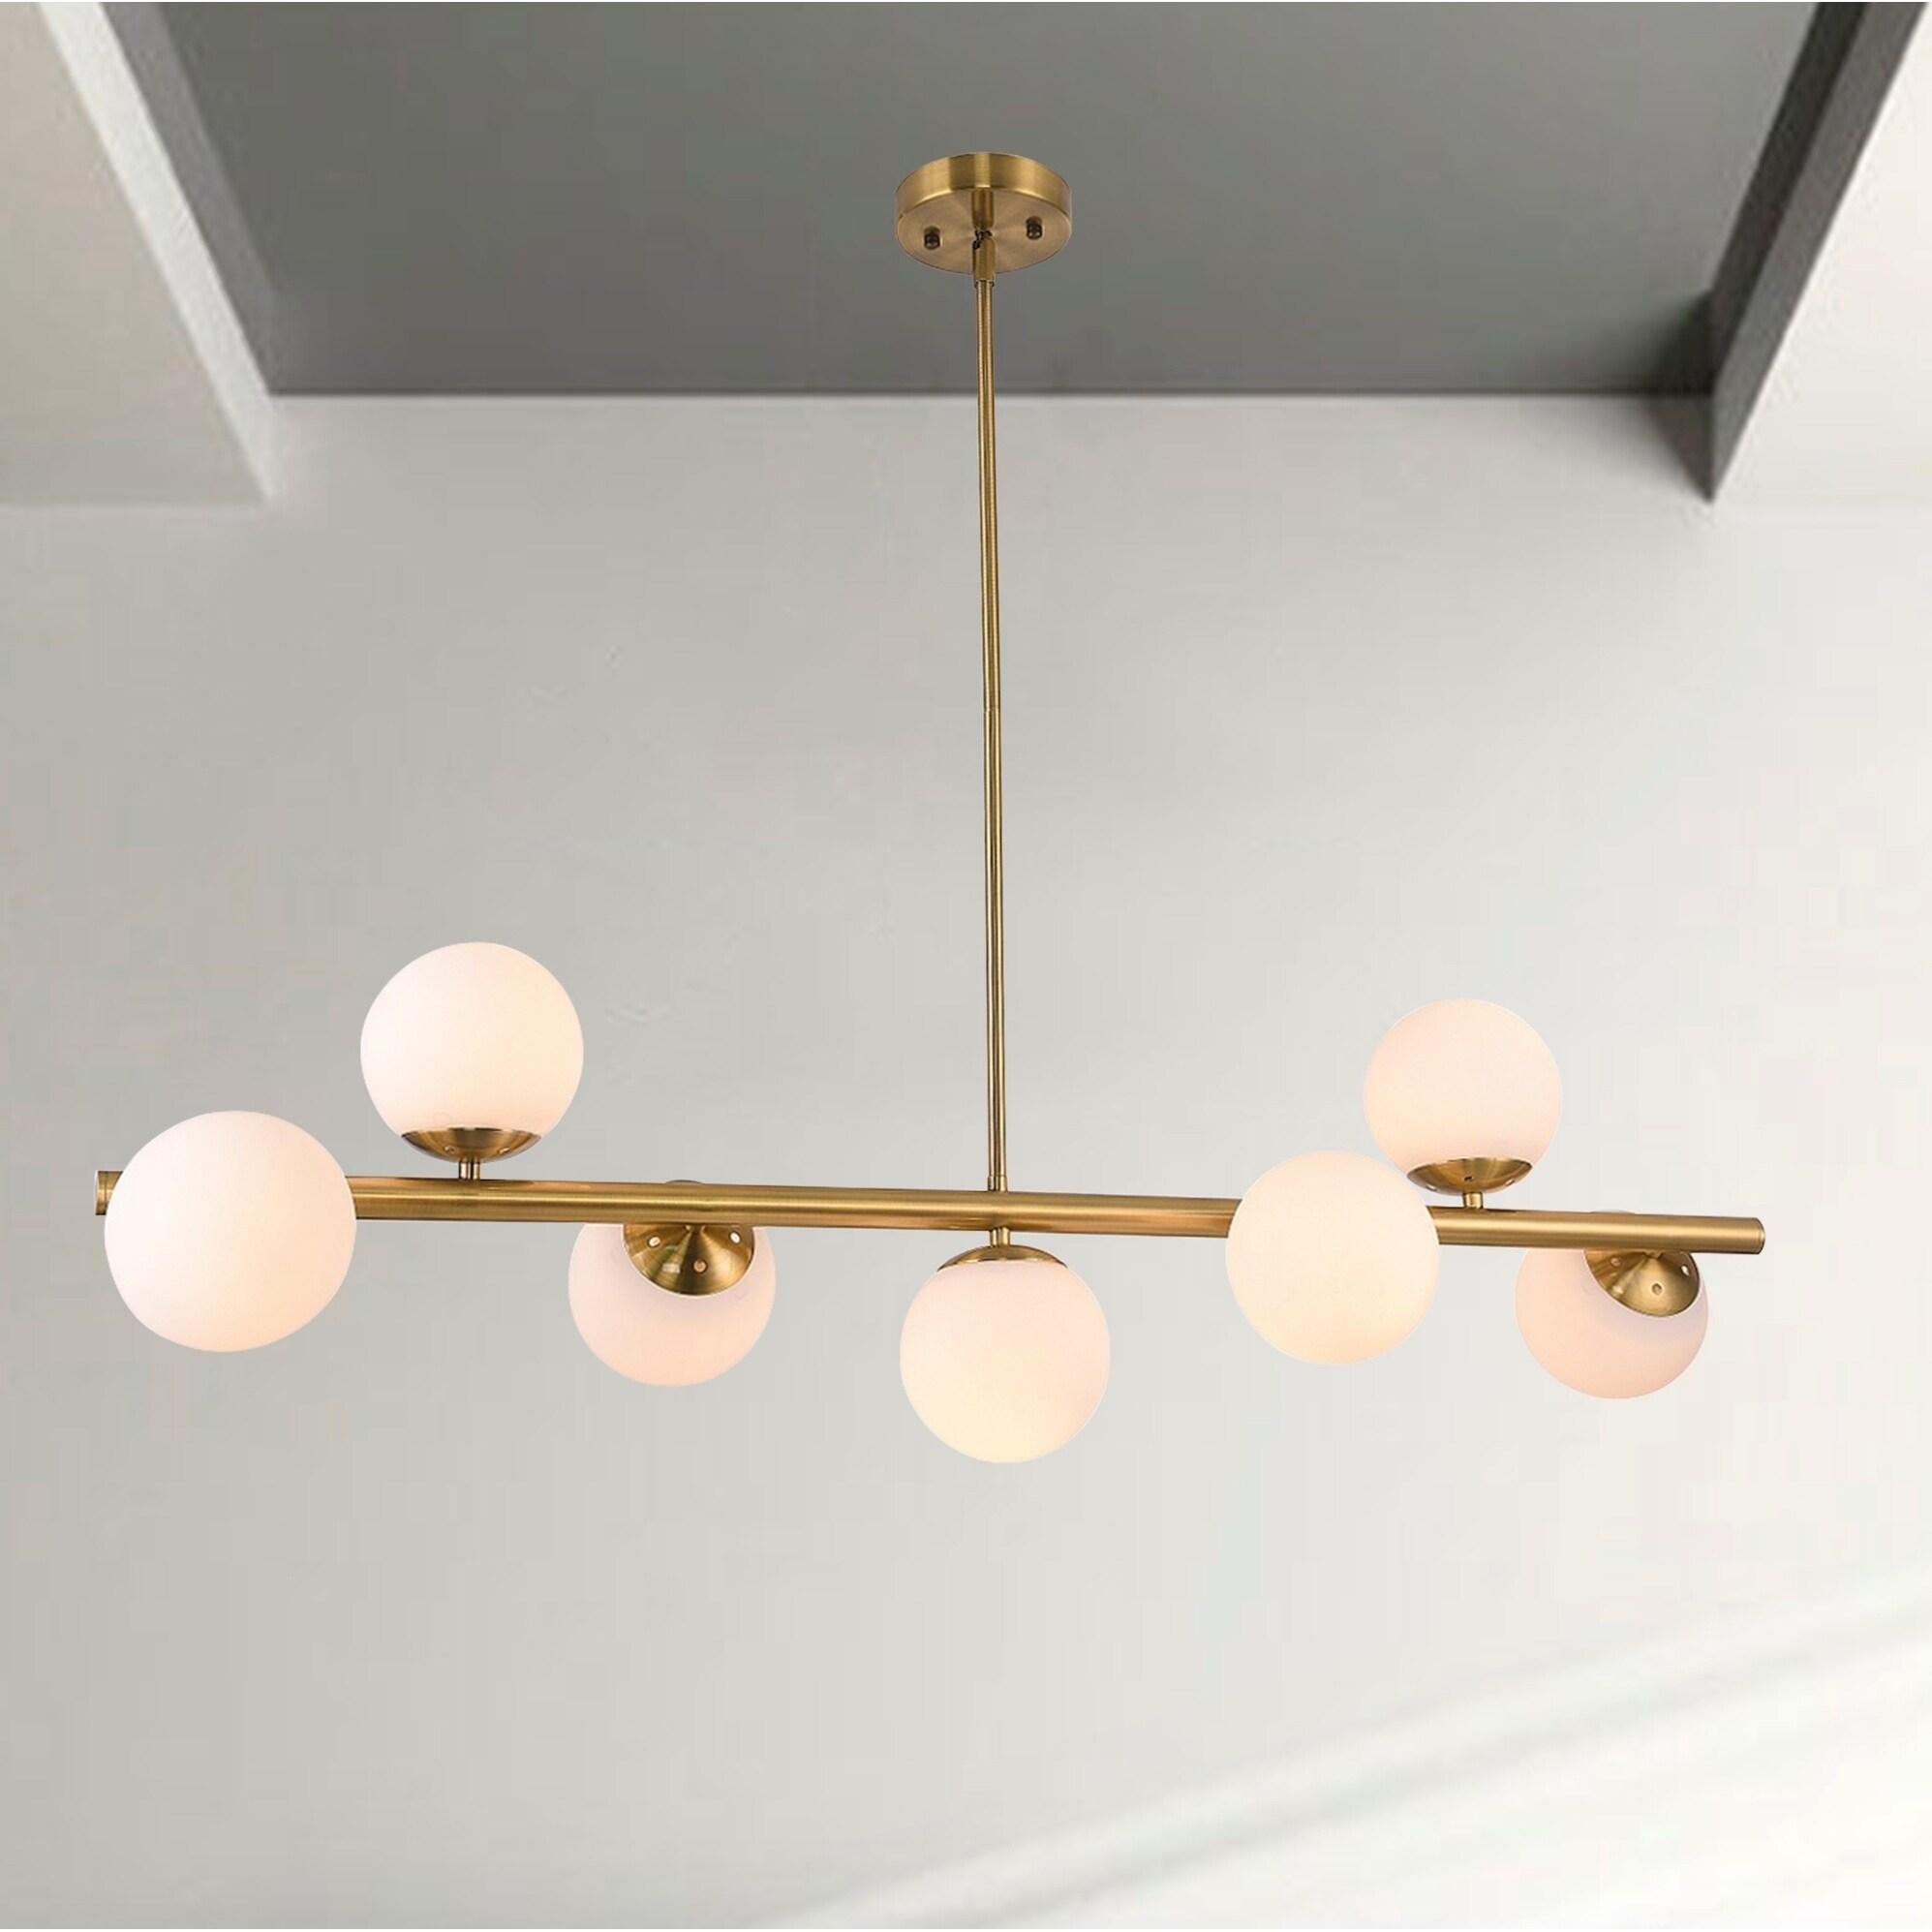 Nethi Antique Brass 7 Light Chandelier Overstock 28153226